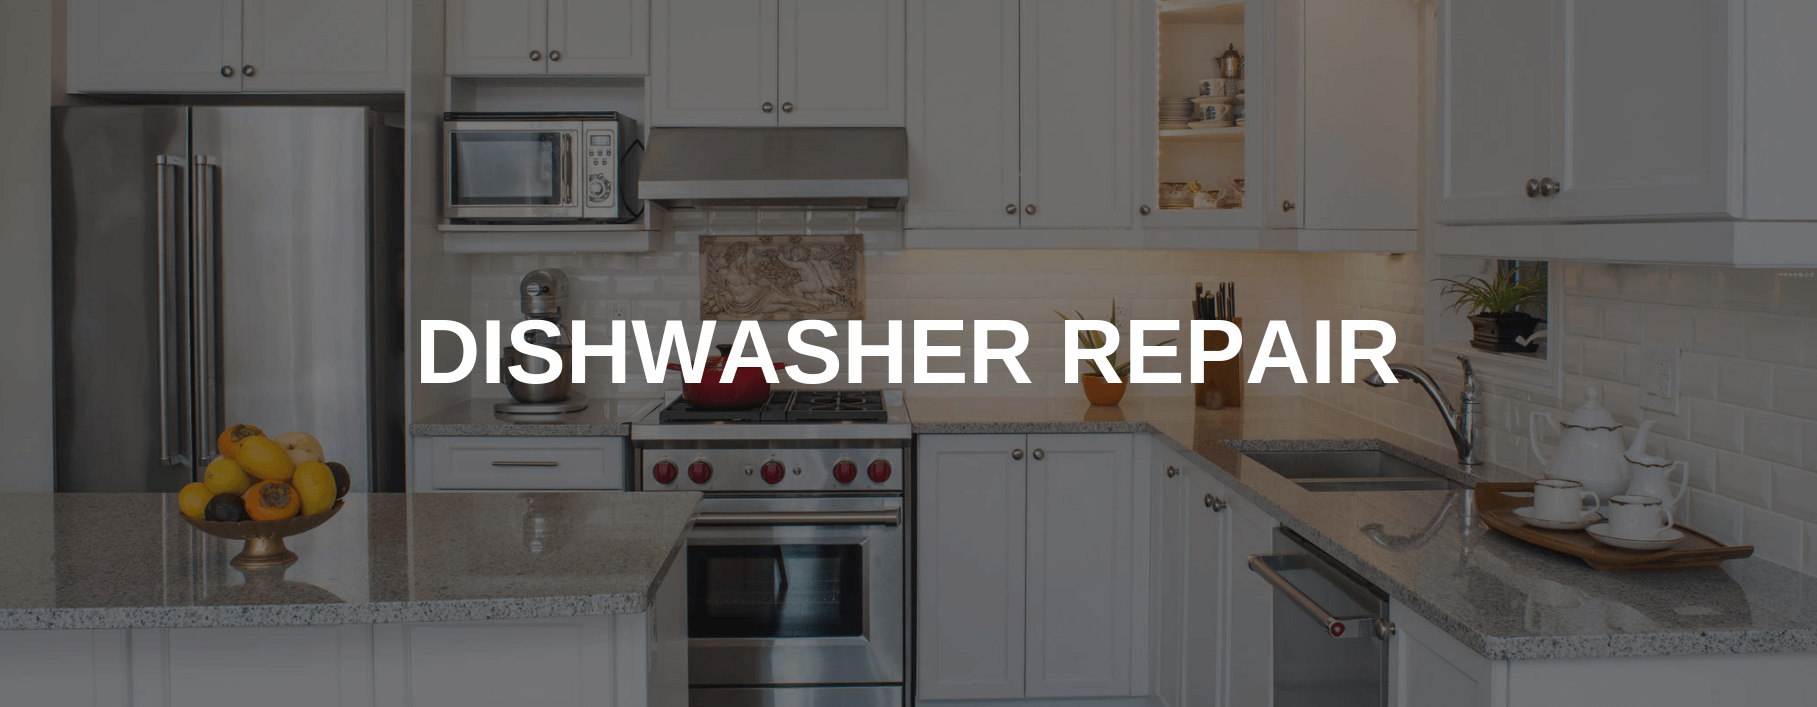 dishwasher repair garland